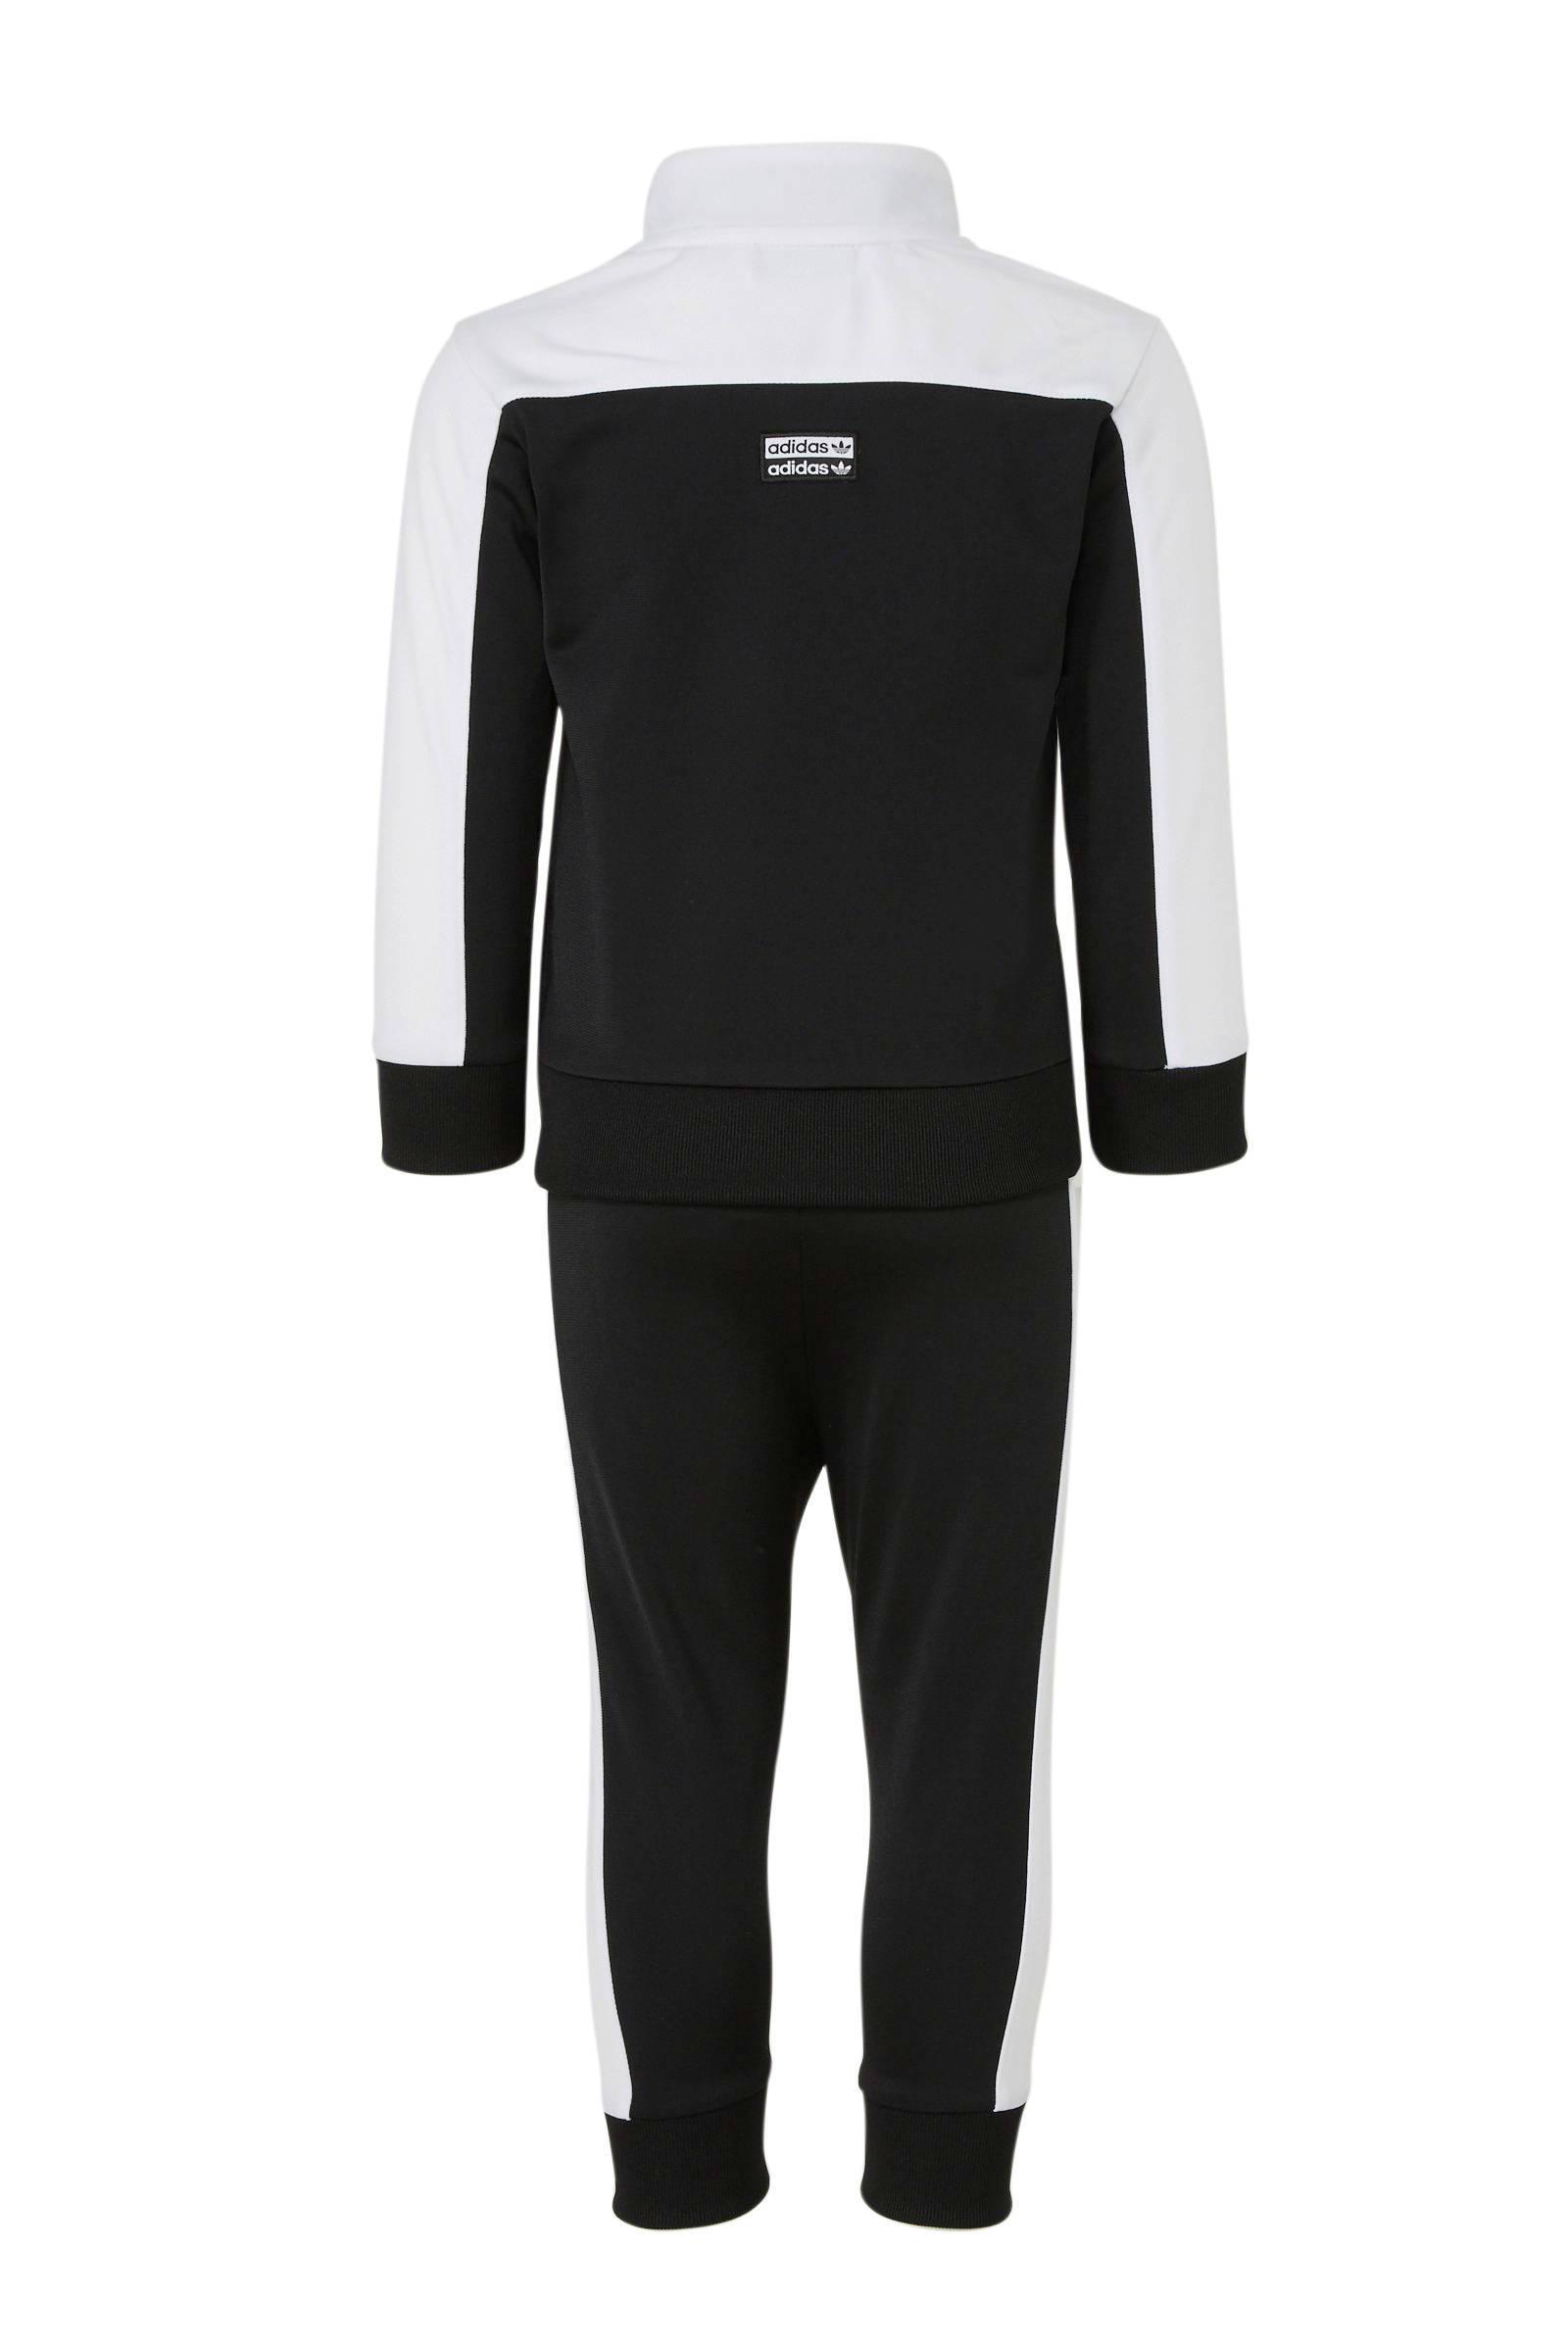 adidas Originals trainingspak zwartwit | wehkamp